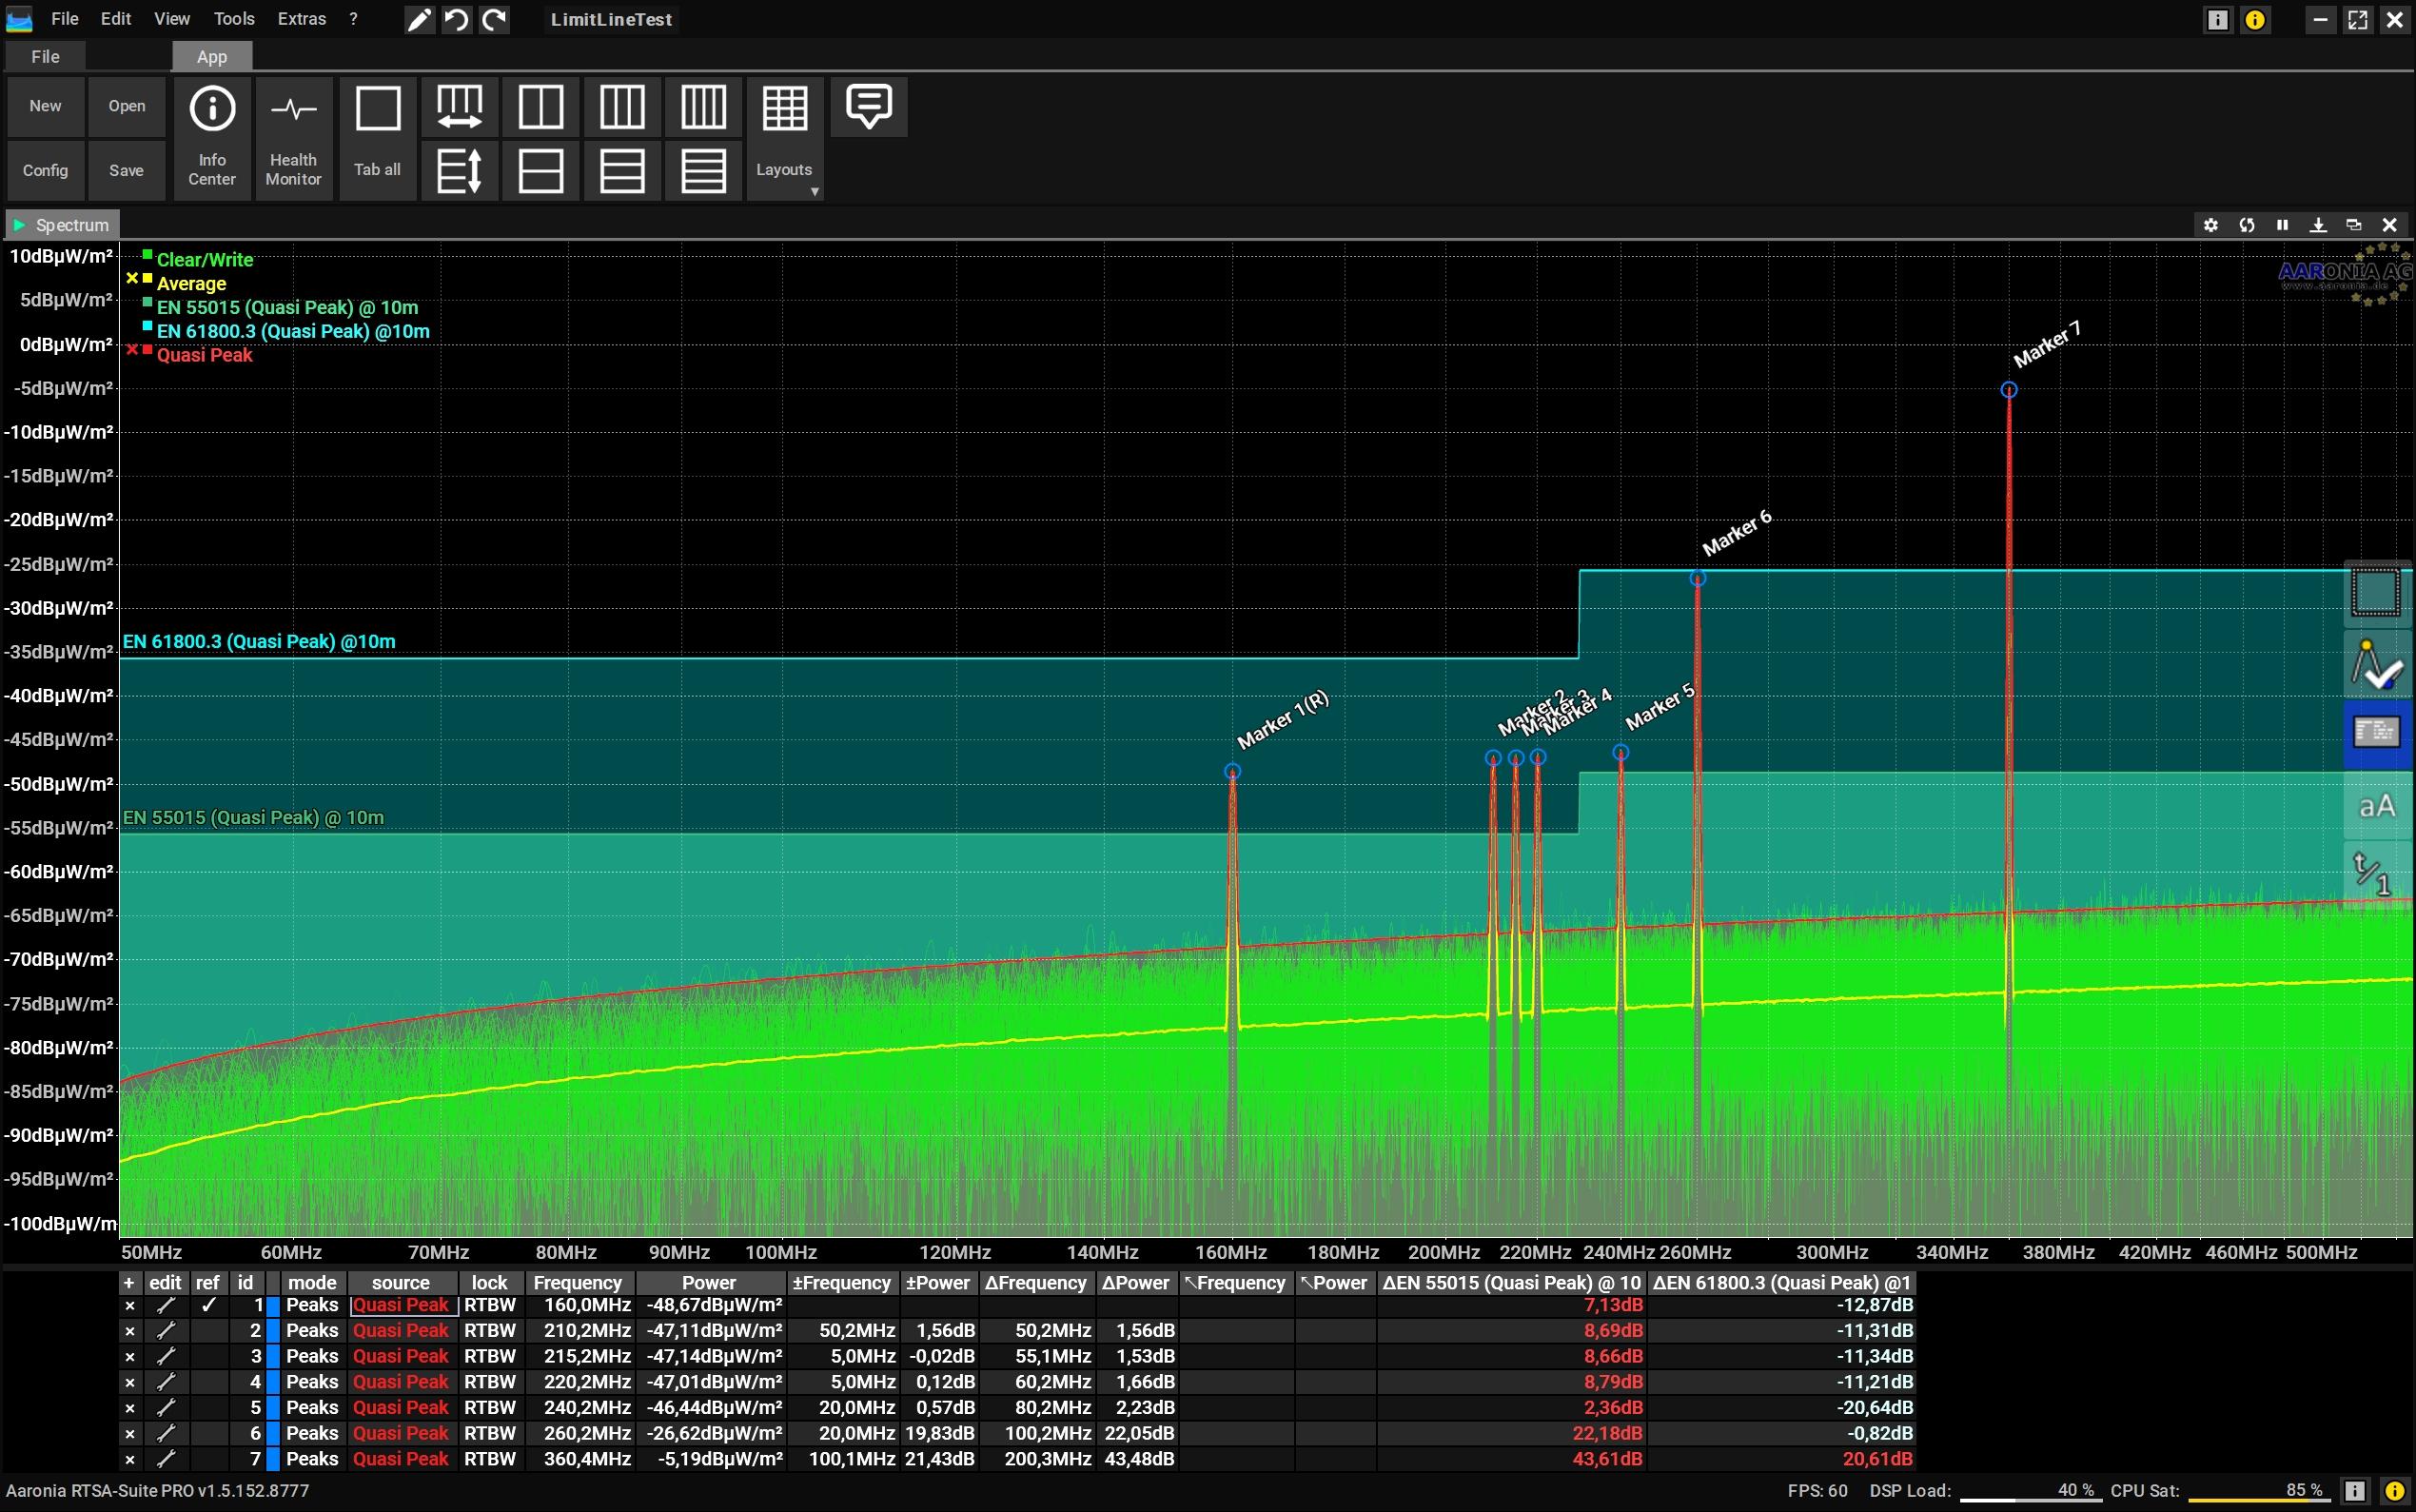 EMC/EMI Limit Line Measurement